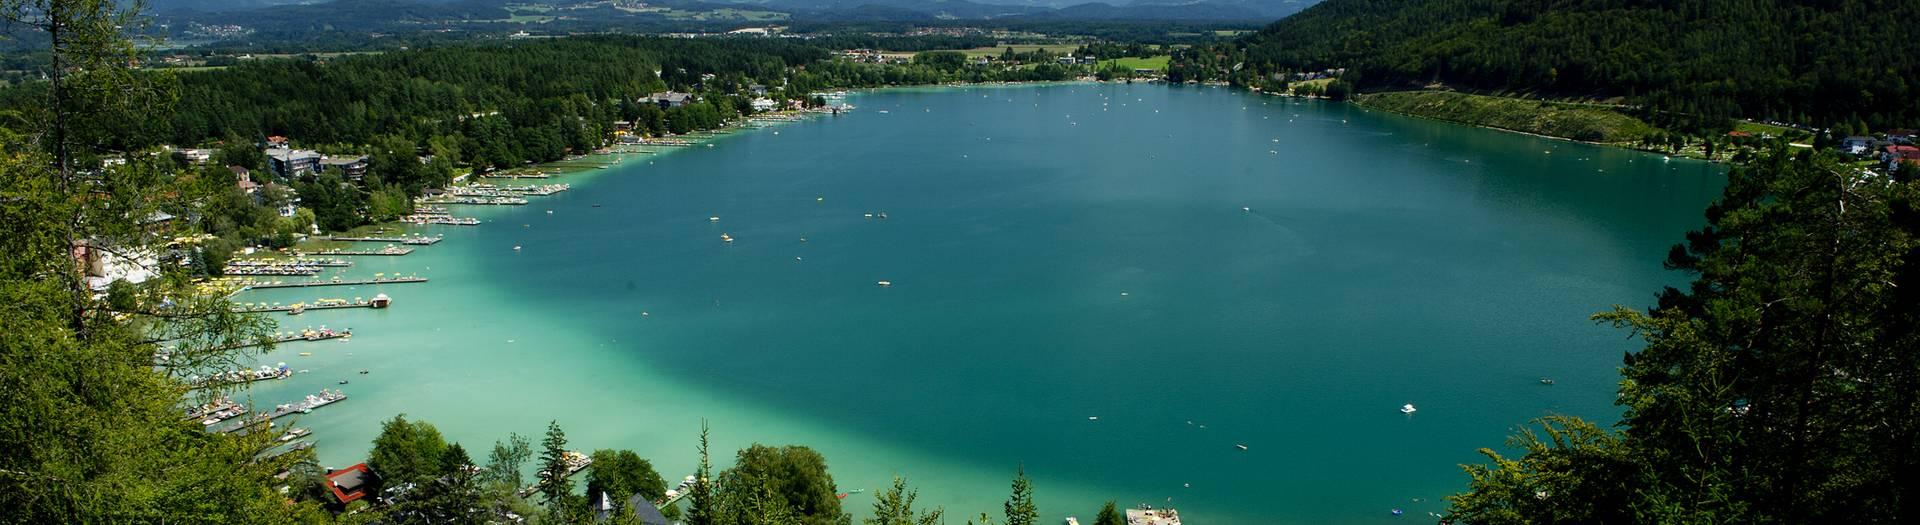 Sommer am Klopeiner See